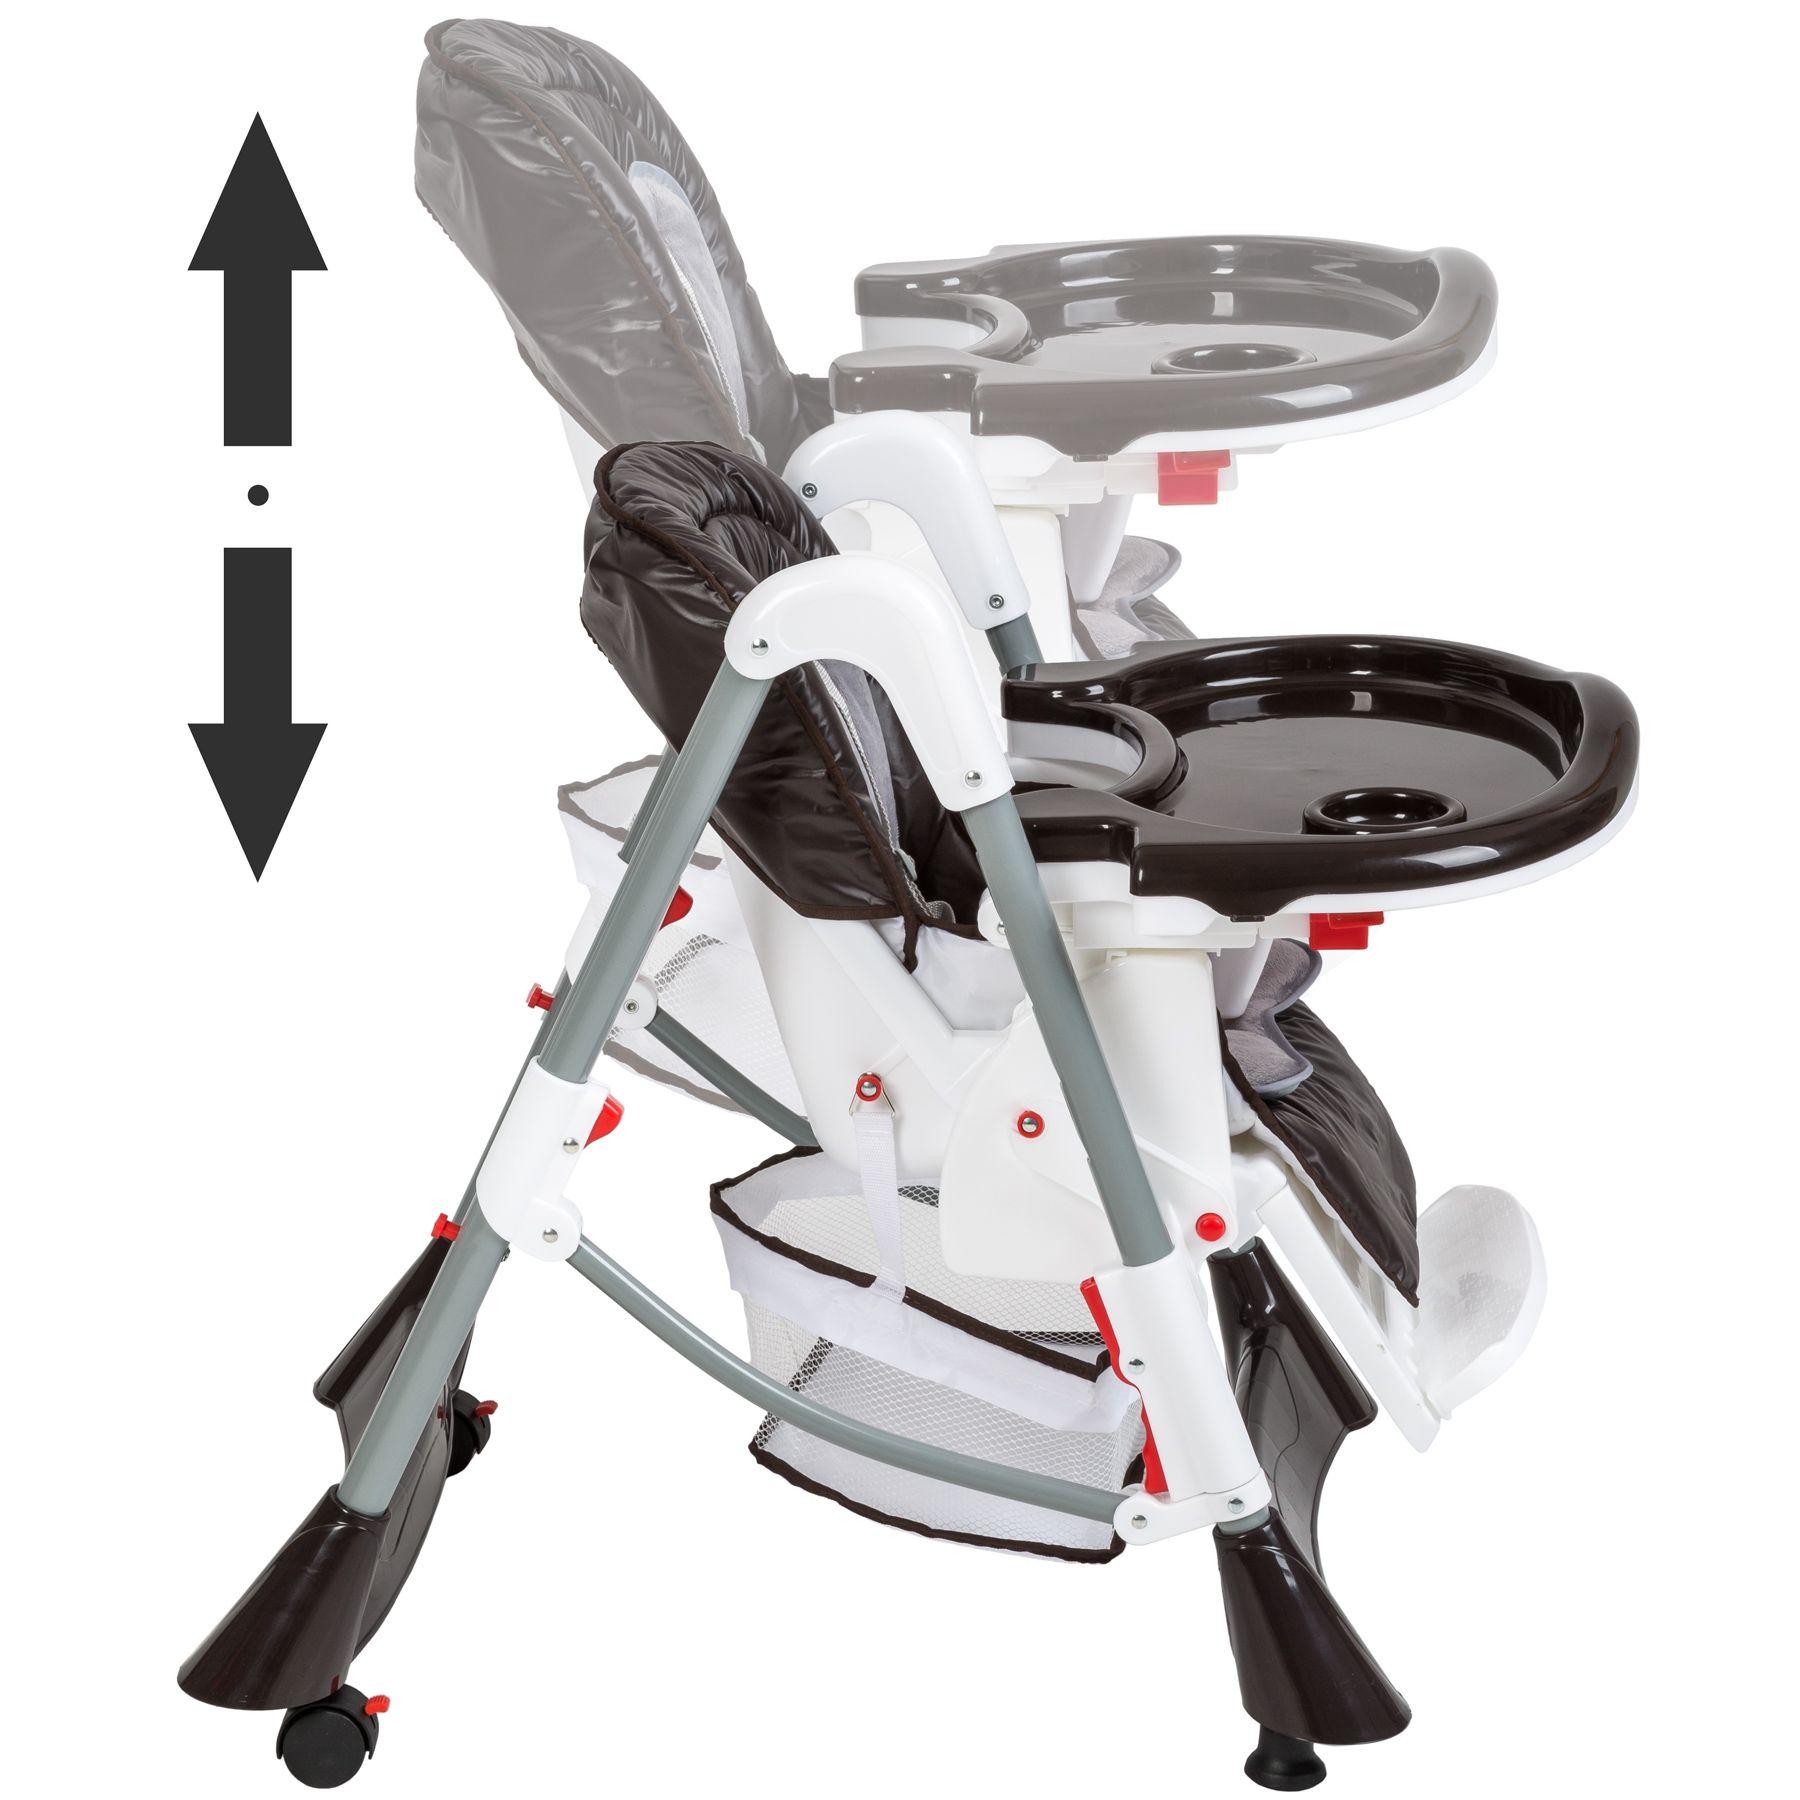 kinderhochstuhl treppenhochstuhl babyhochstuhl babystuhl kinderstuhl kaffeebraun ebay. Black Bedroom Furniture Sets. Home Design Ideas